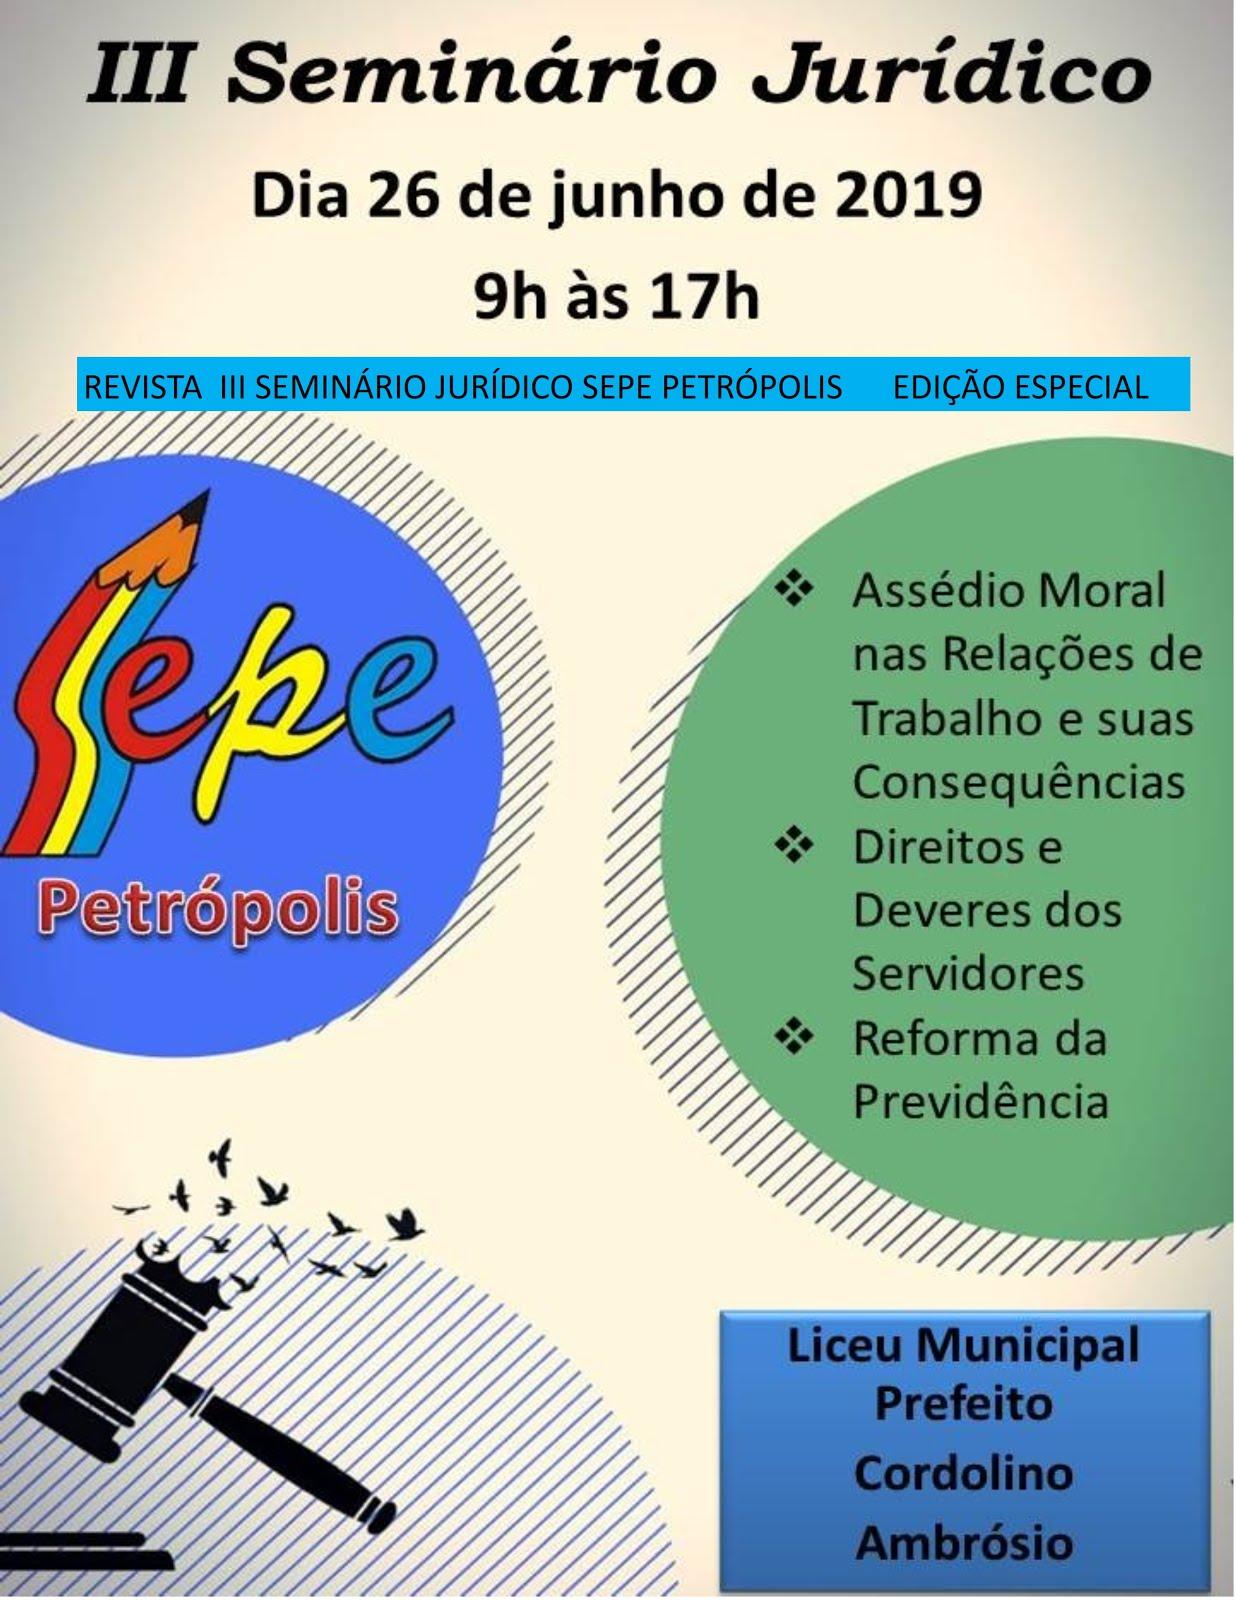 REVISTA DIGITAL SEMINÁRIO JURÍDICO